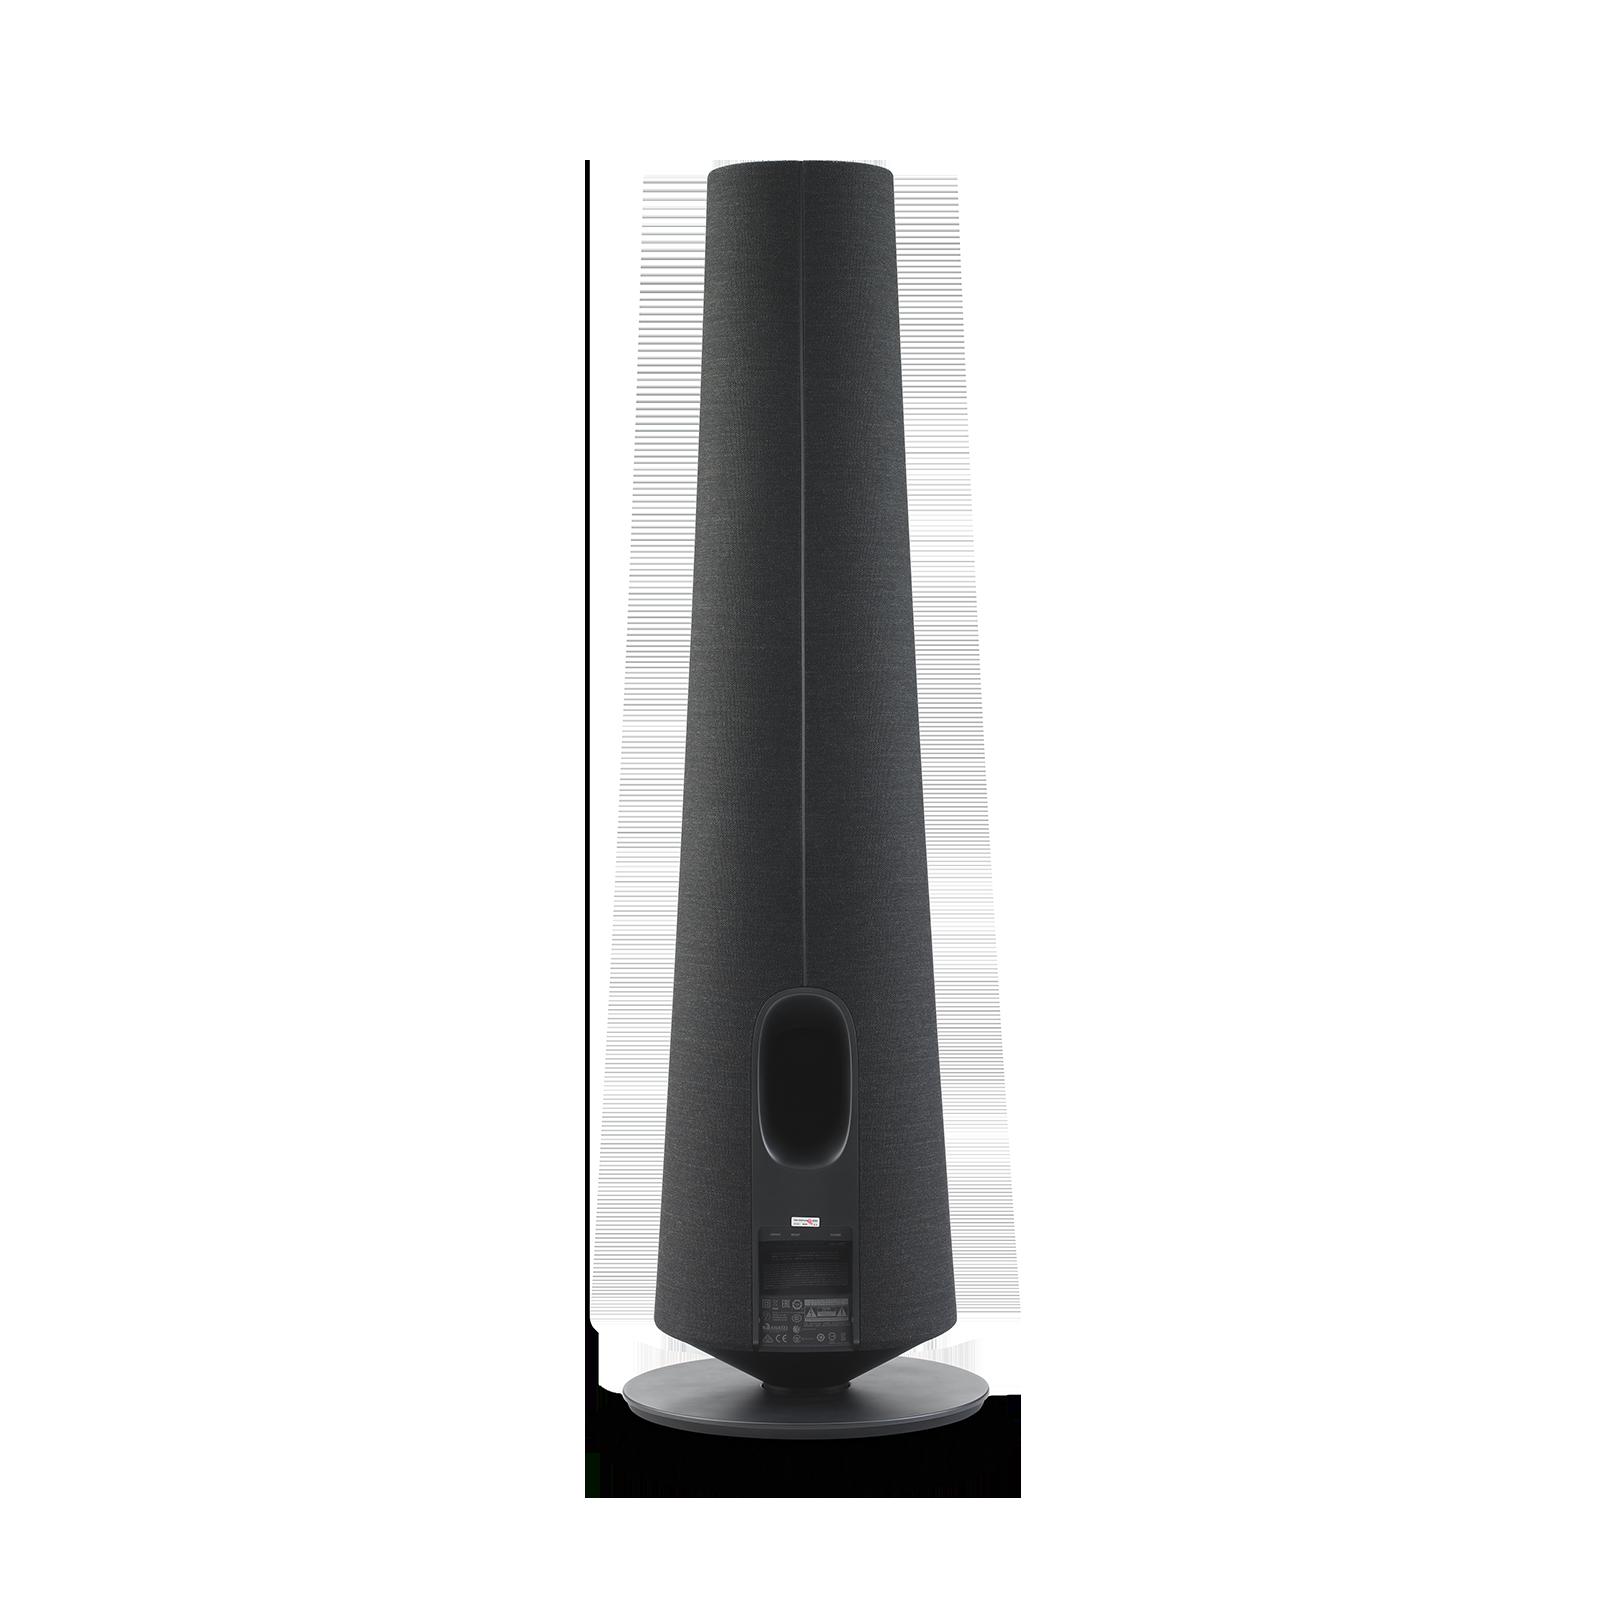 Harman Kardon Citation Tower - Black - Smart Premium Floorstanding Speaker that delivers an impactful performance - Back